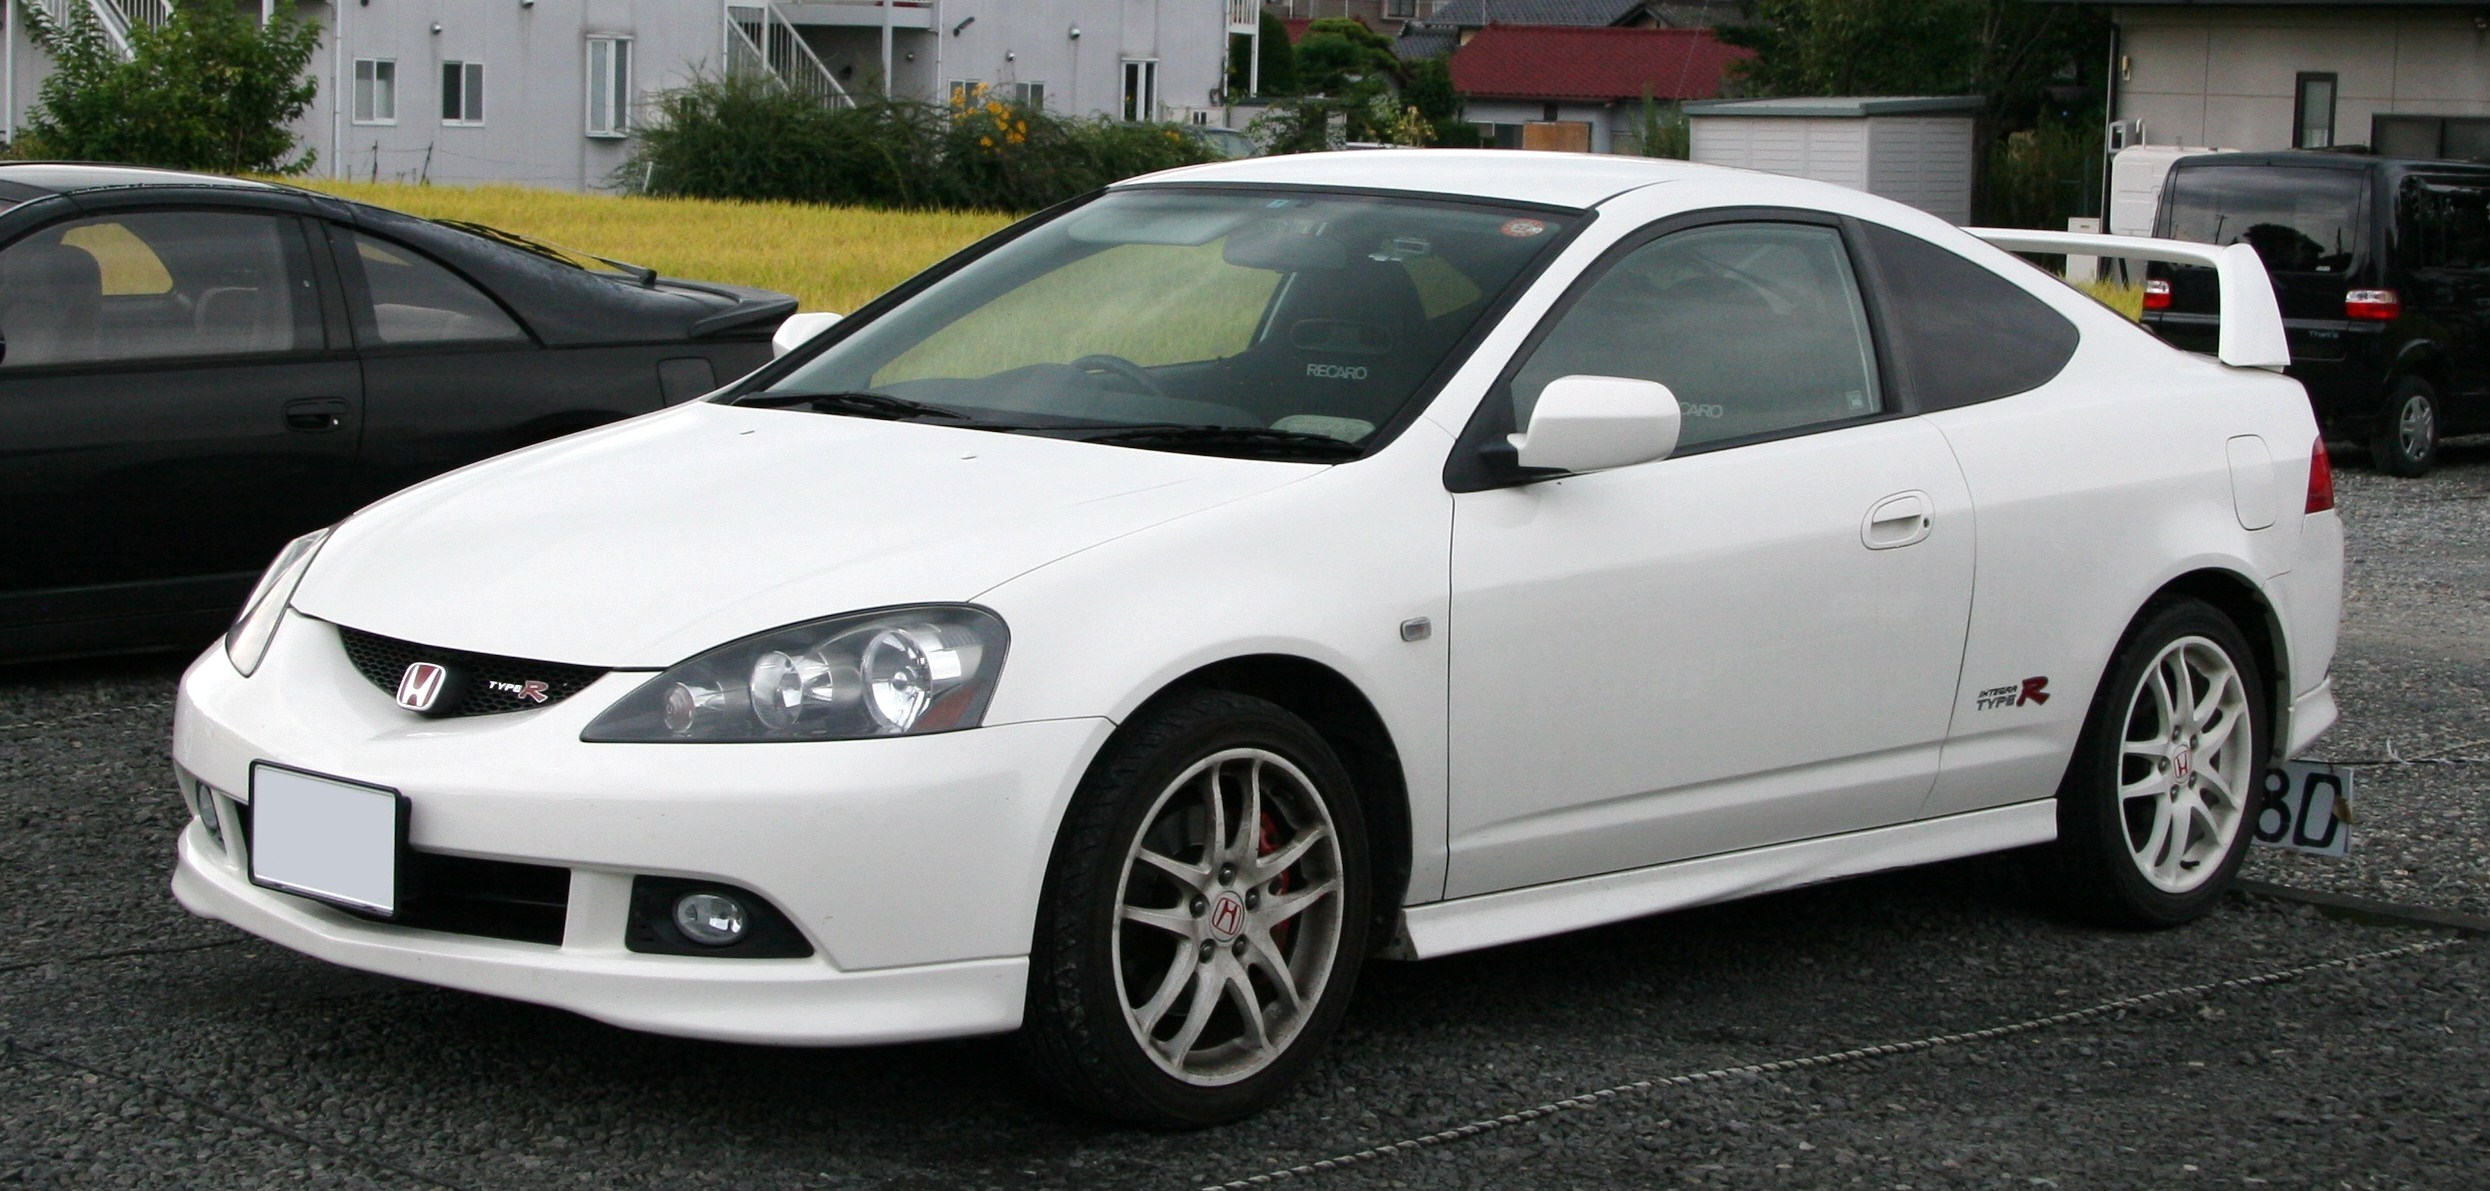 2001 Acura Integra Type R Front